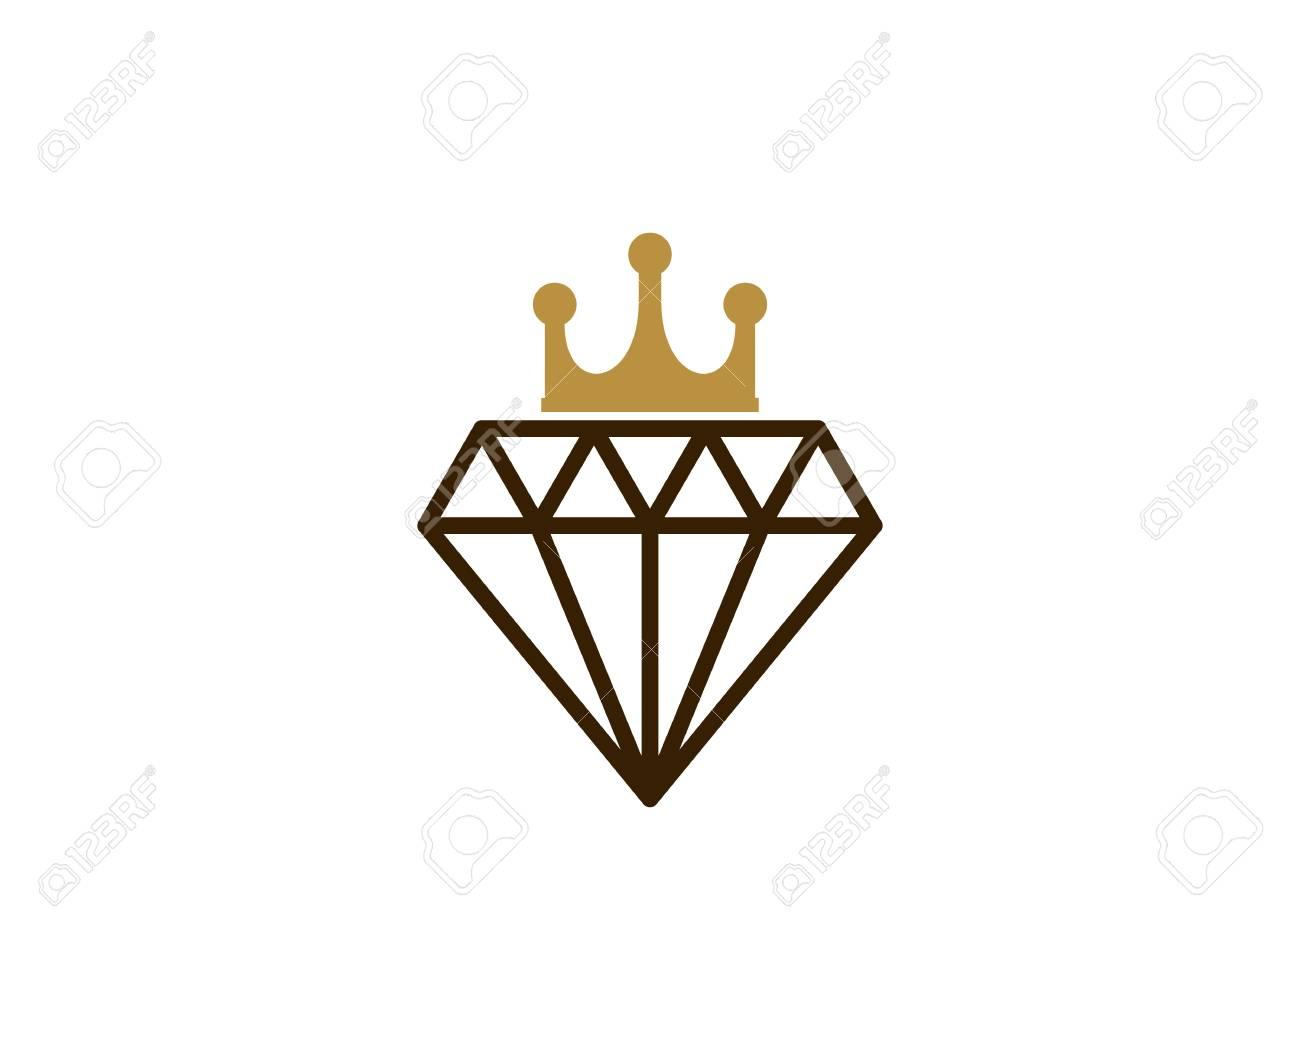 diamond with king crown icon logo design element royalty free rh 123rf com king crown logo icon